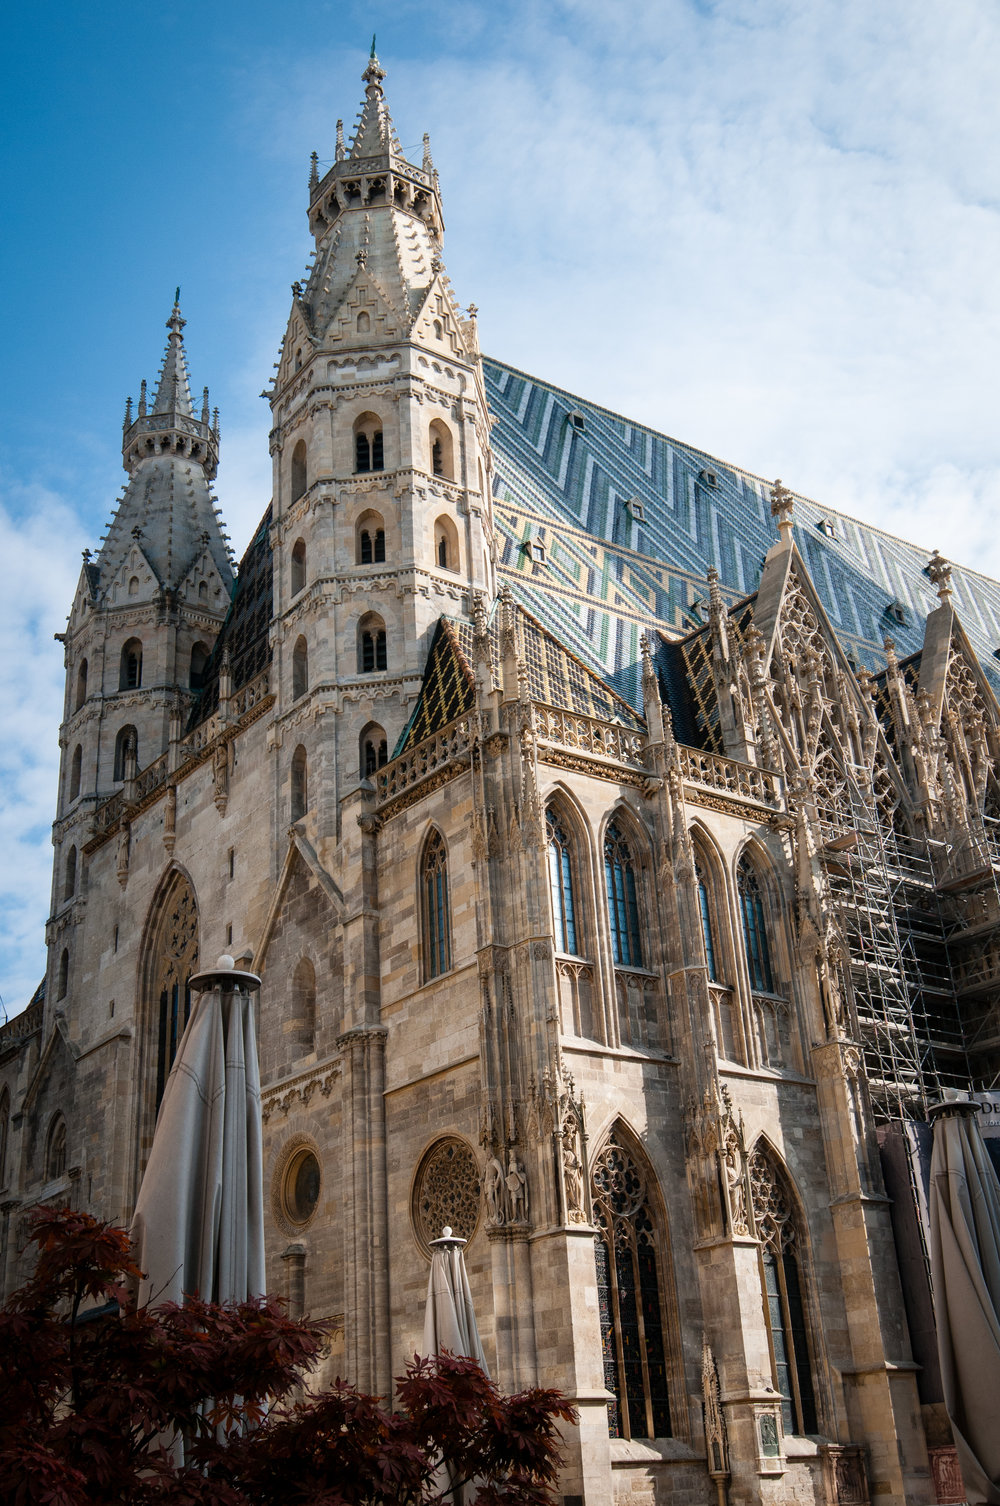 Exterior Facade - St. Stephen's Cathedral, Vienna